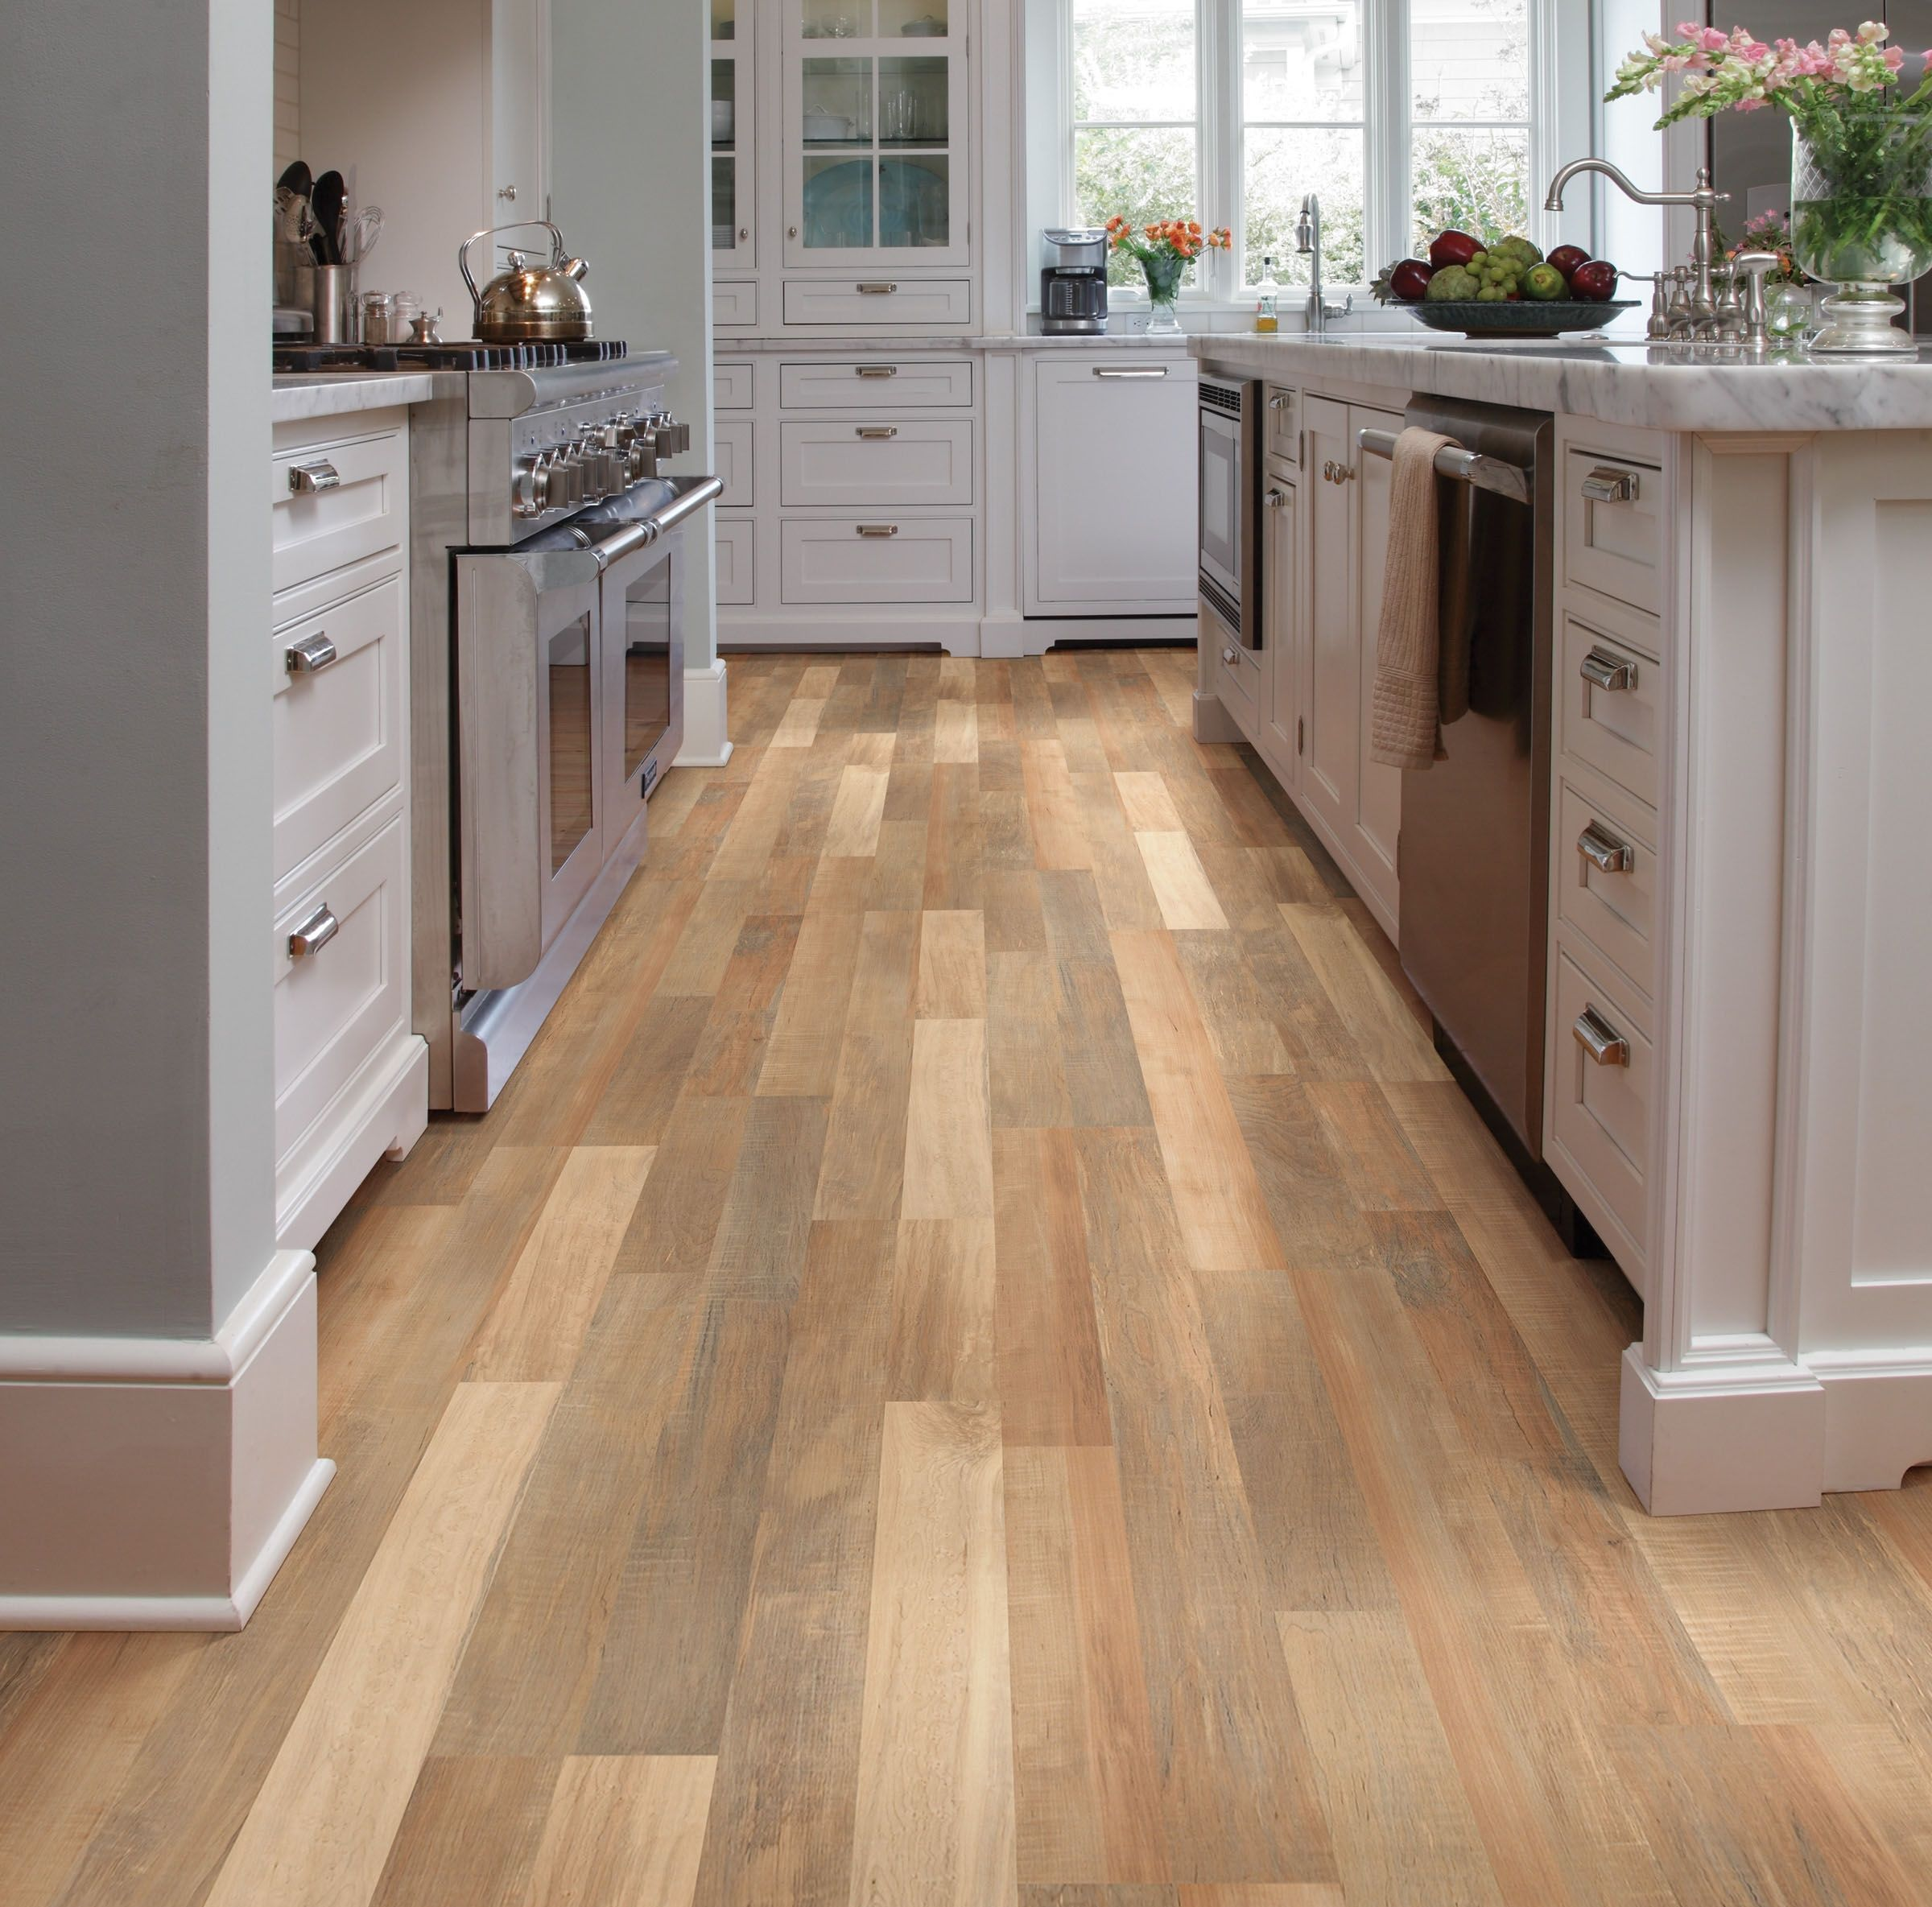 Home Depot Lifeproof Rigid Core Luxury Vinyl Flooring in